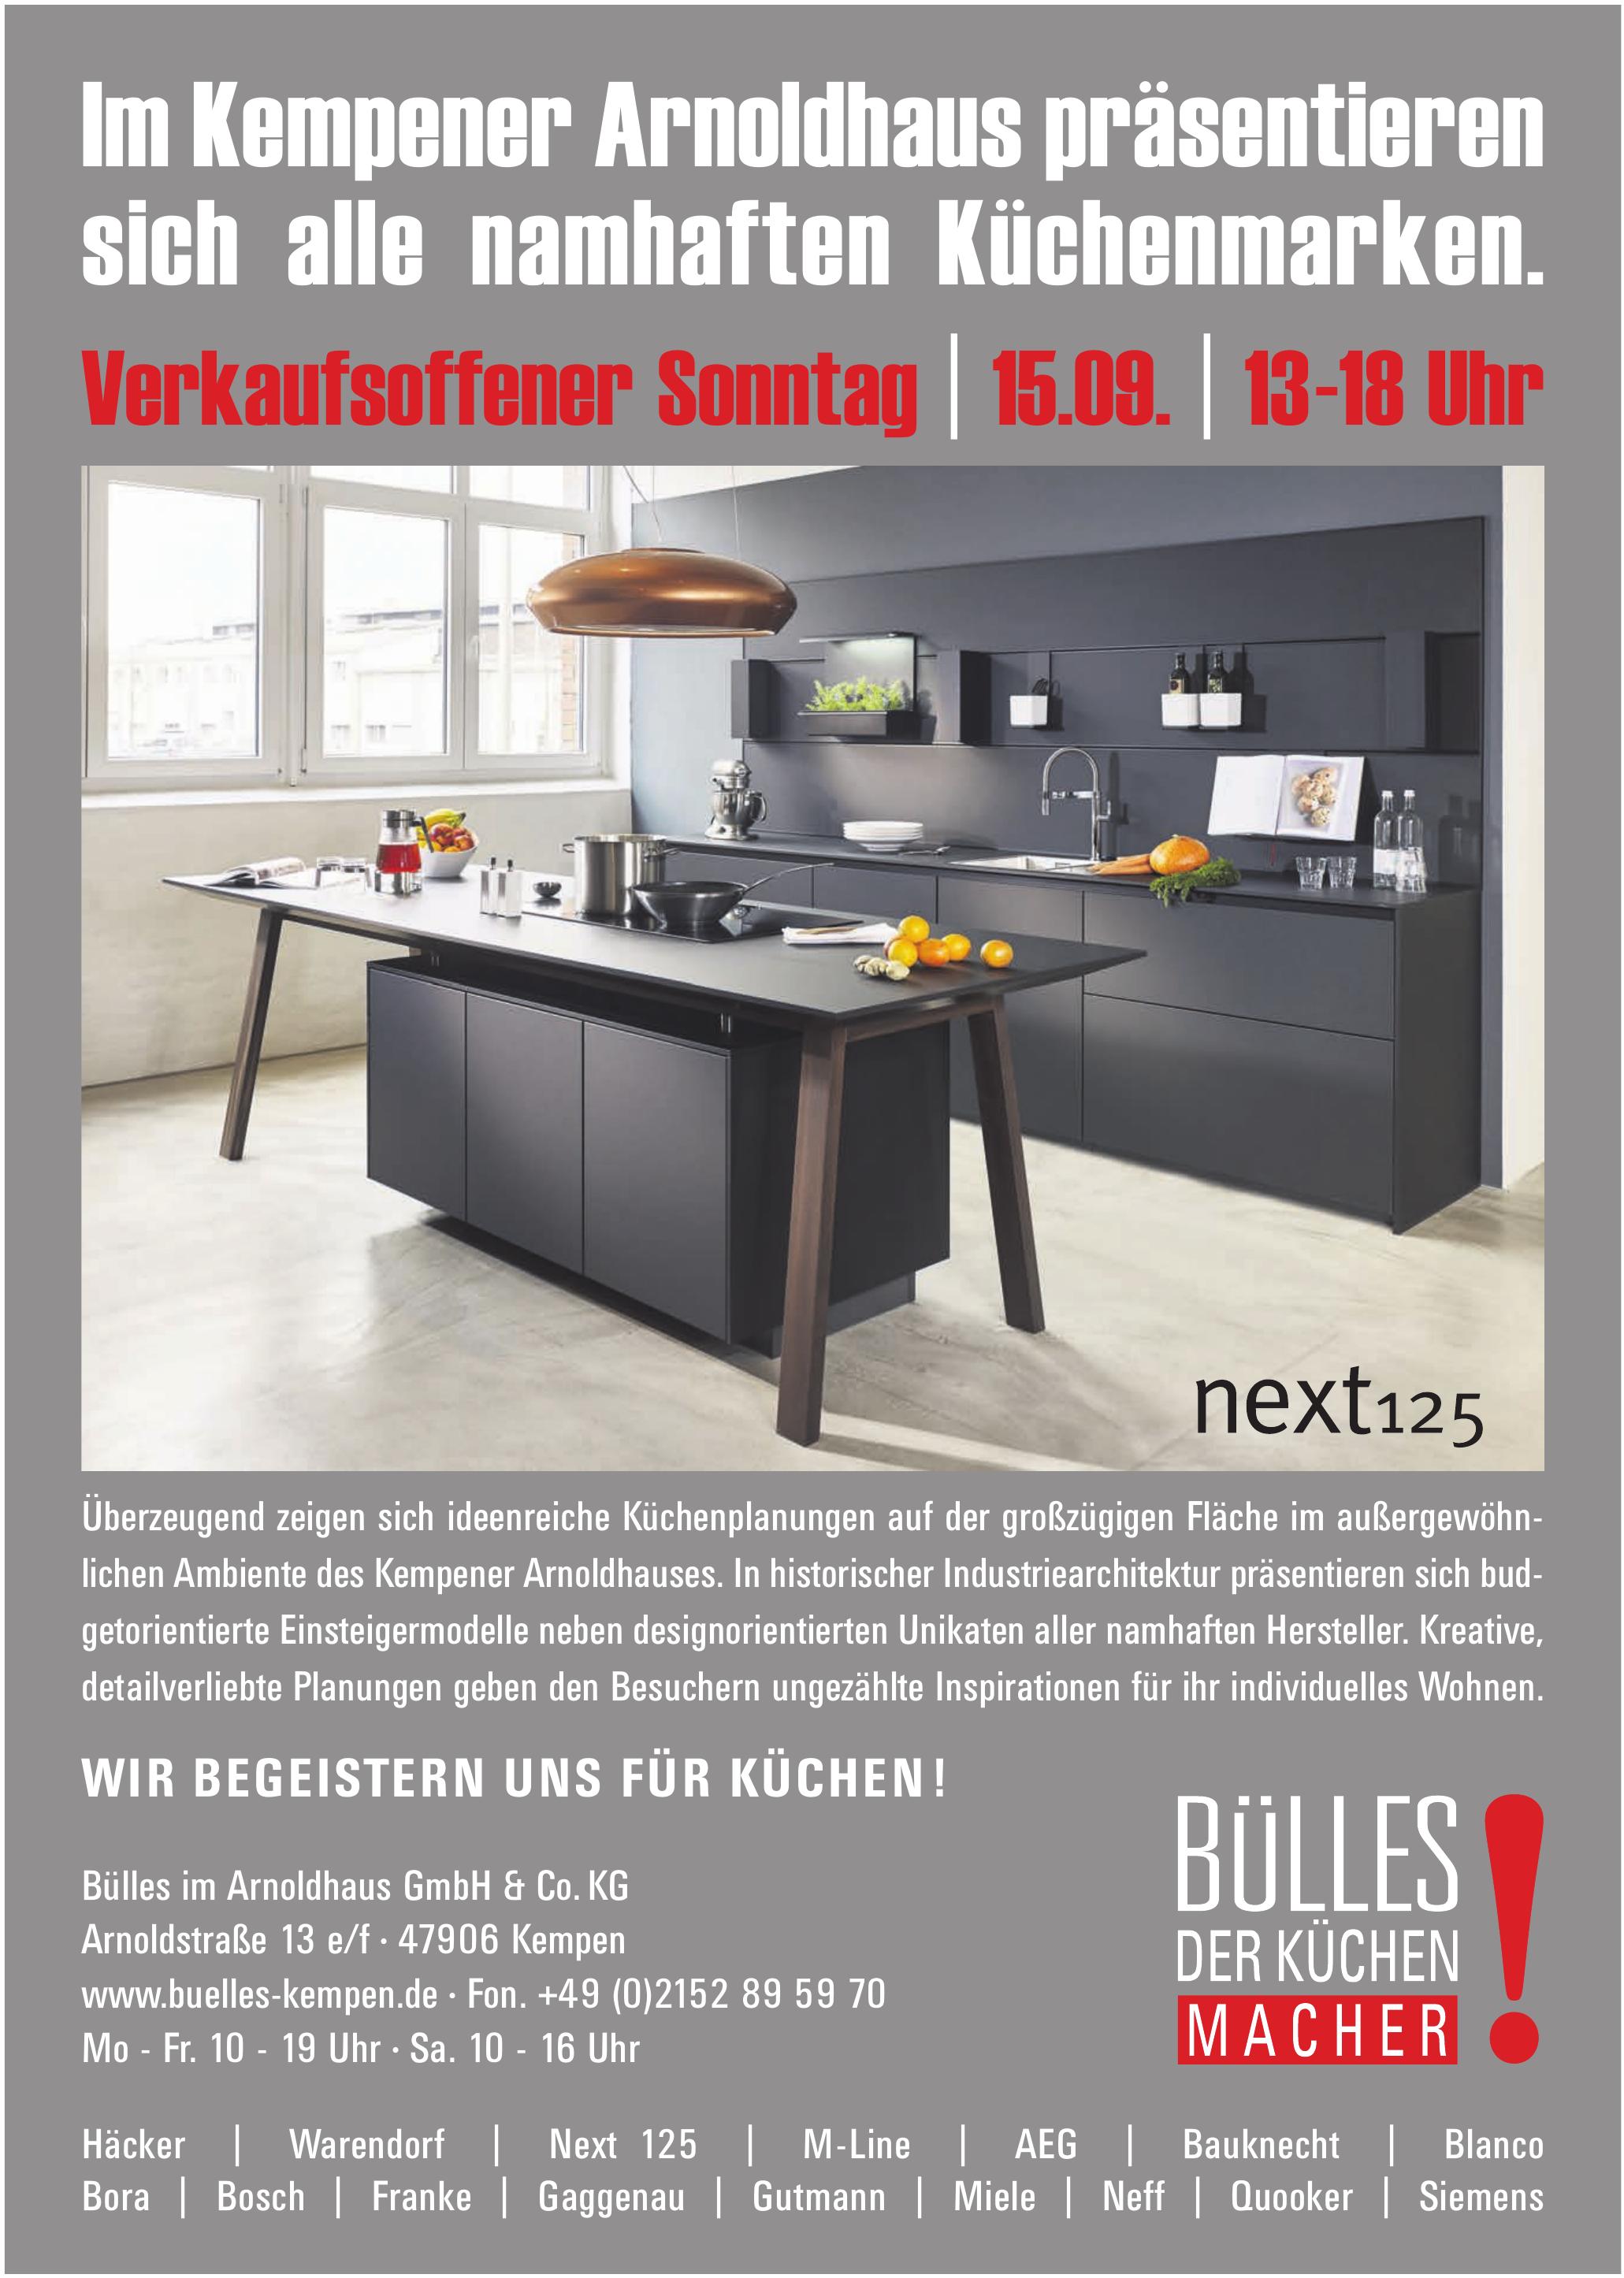 Bülles im Arnoldhaus GmbH & Co. KG